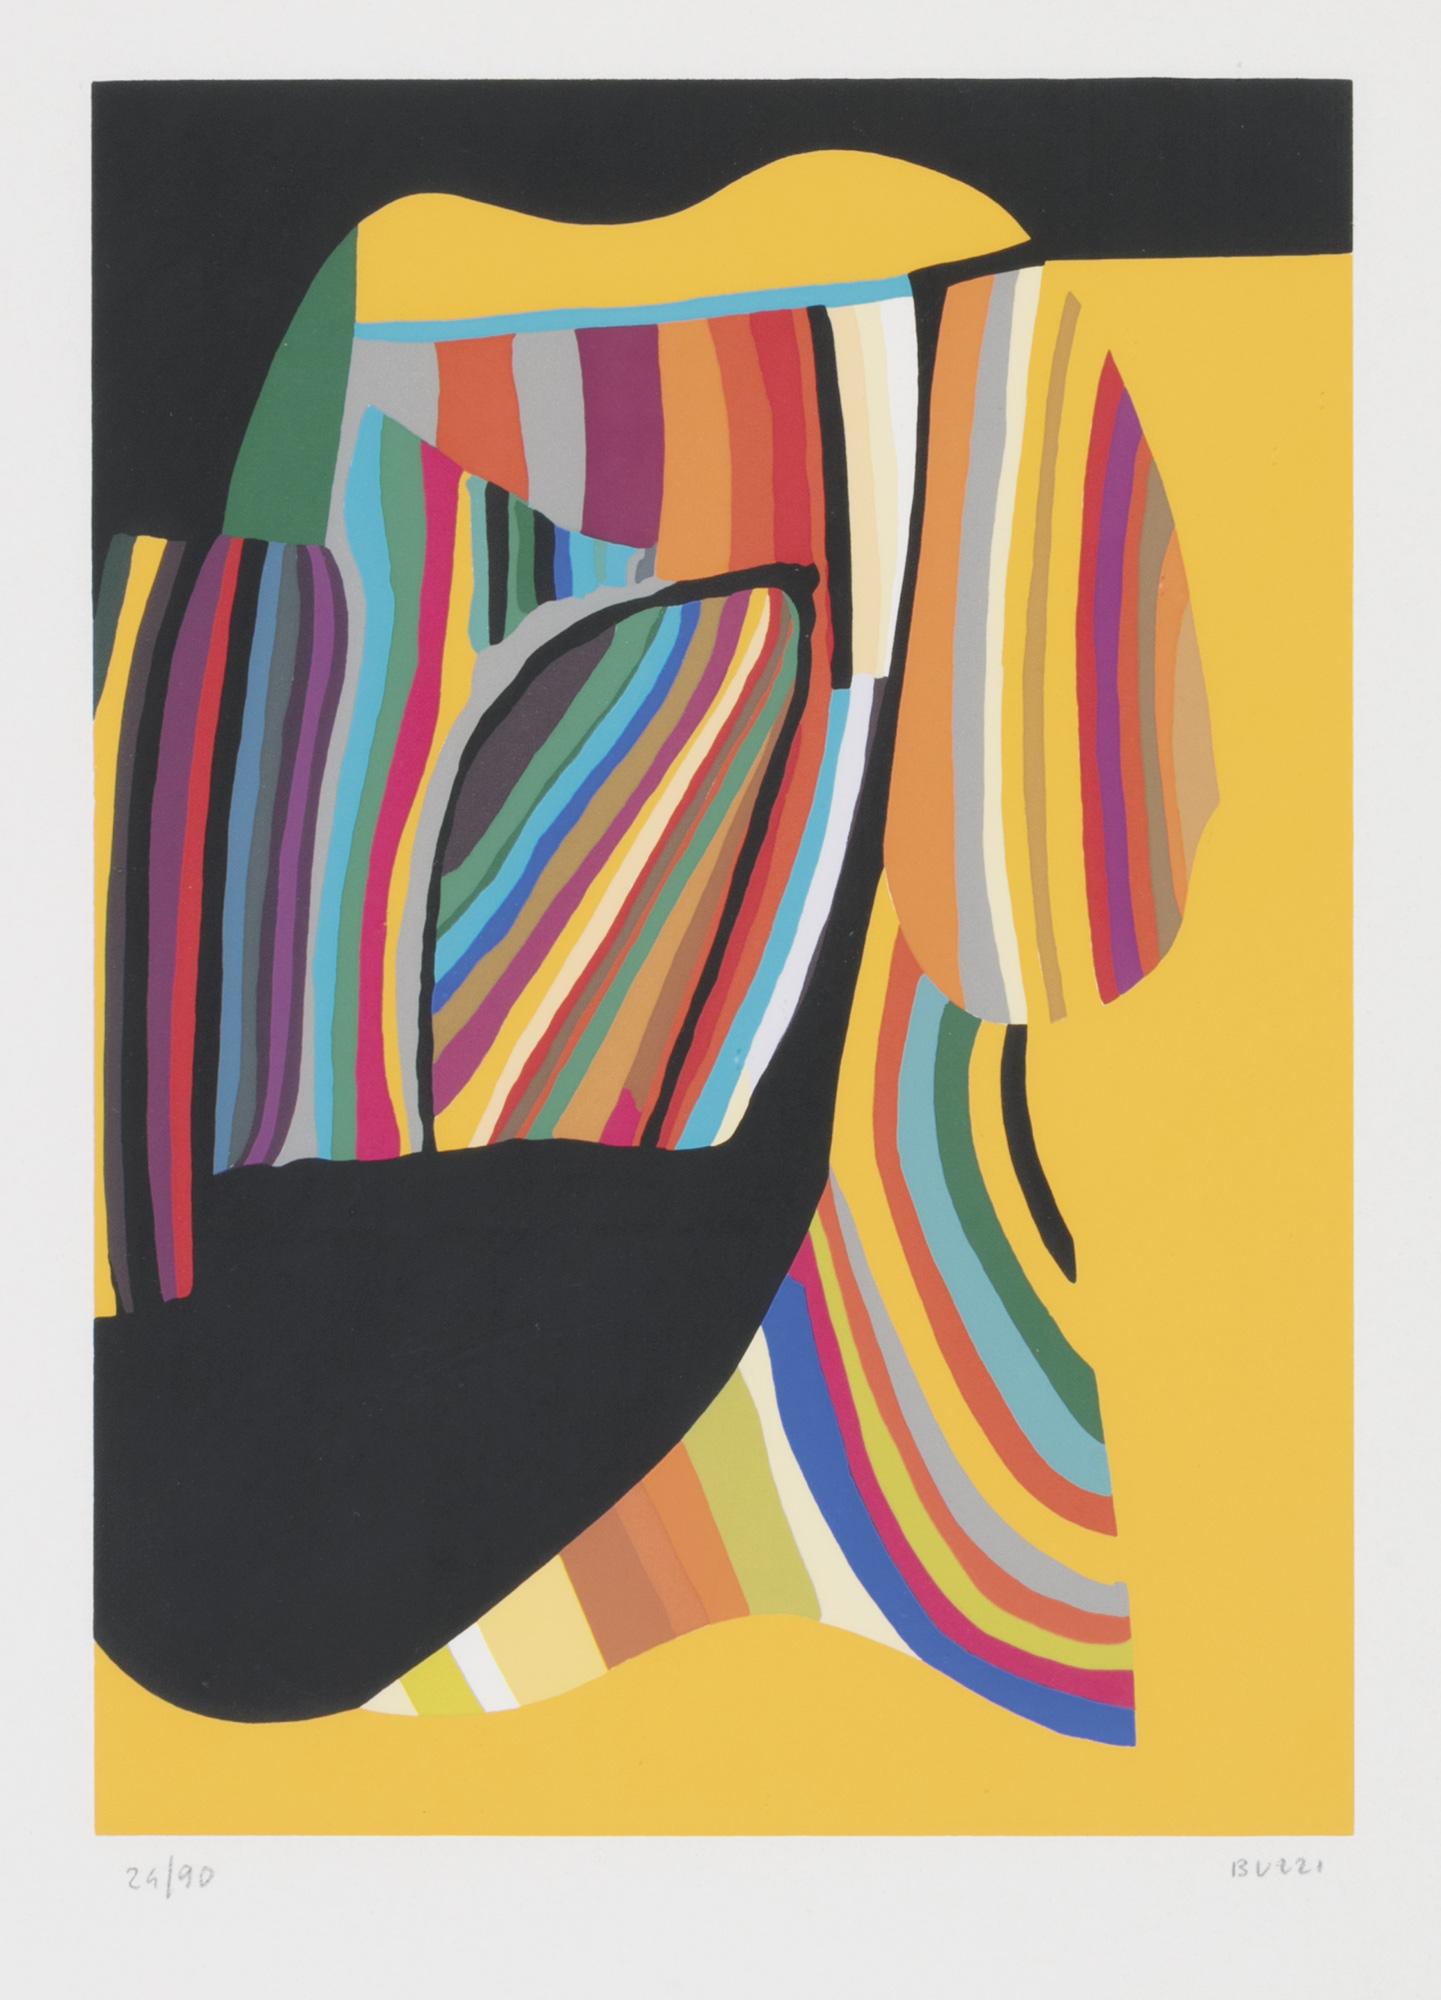 Serigrafia, 1976